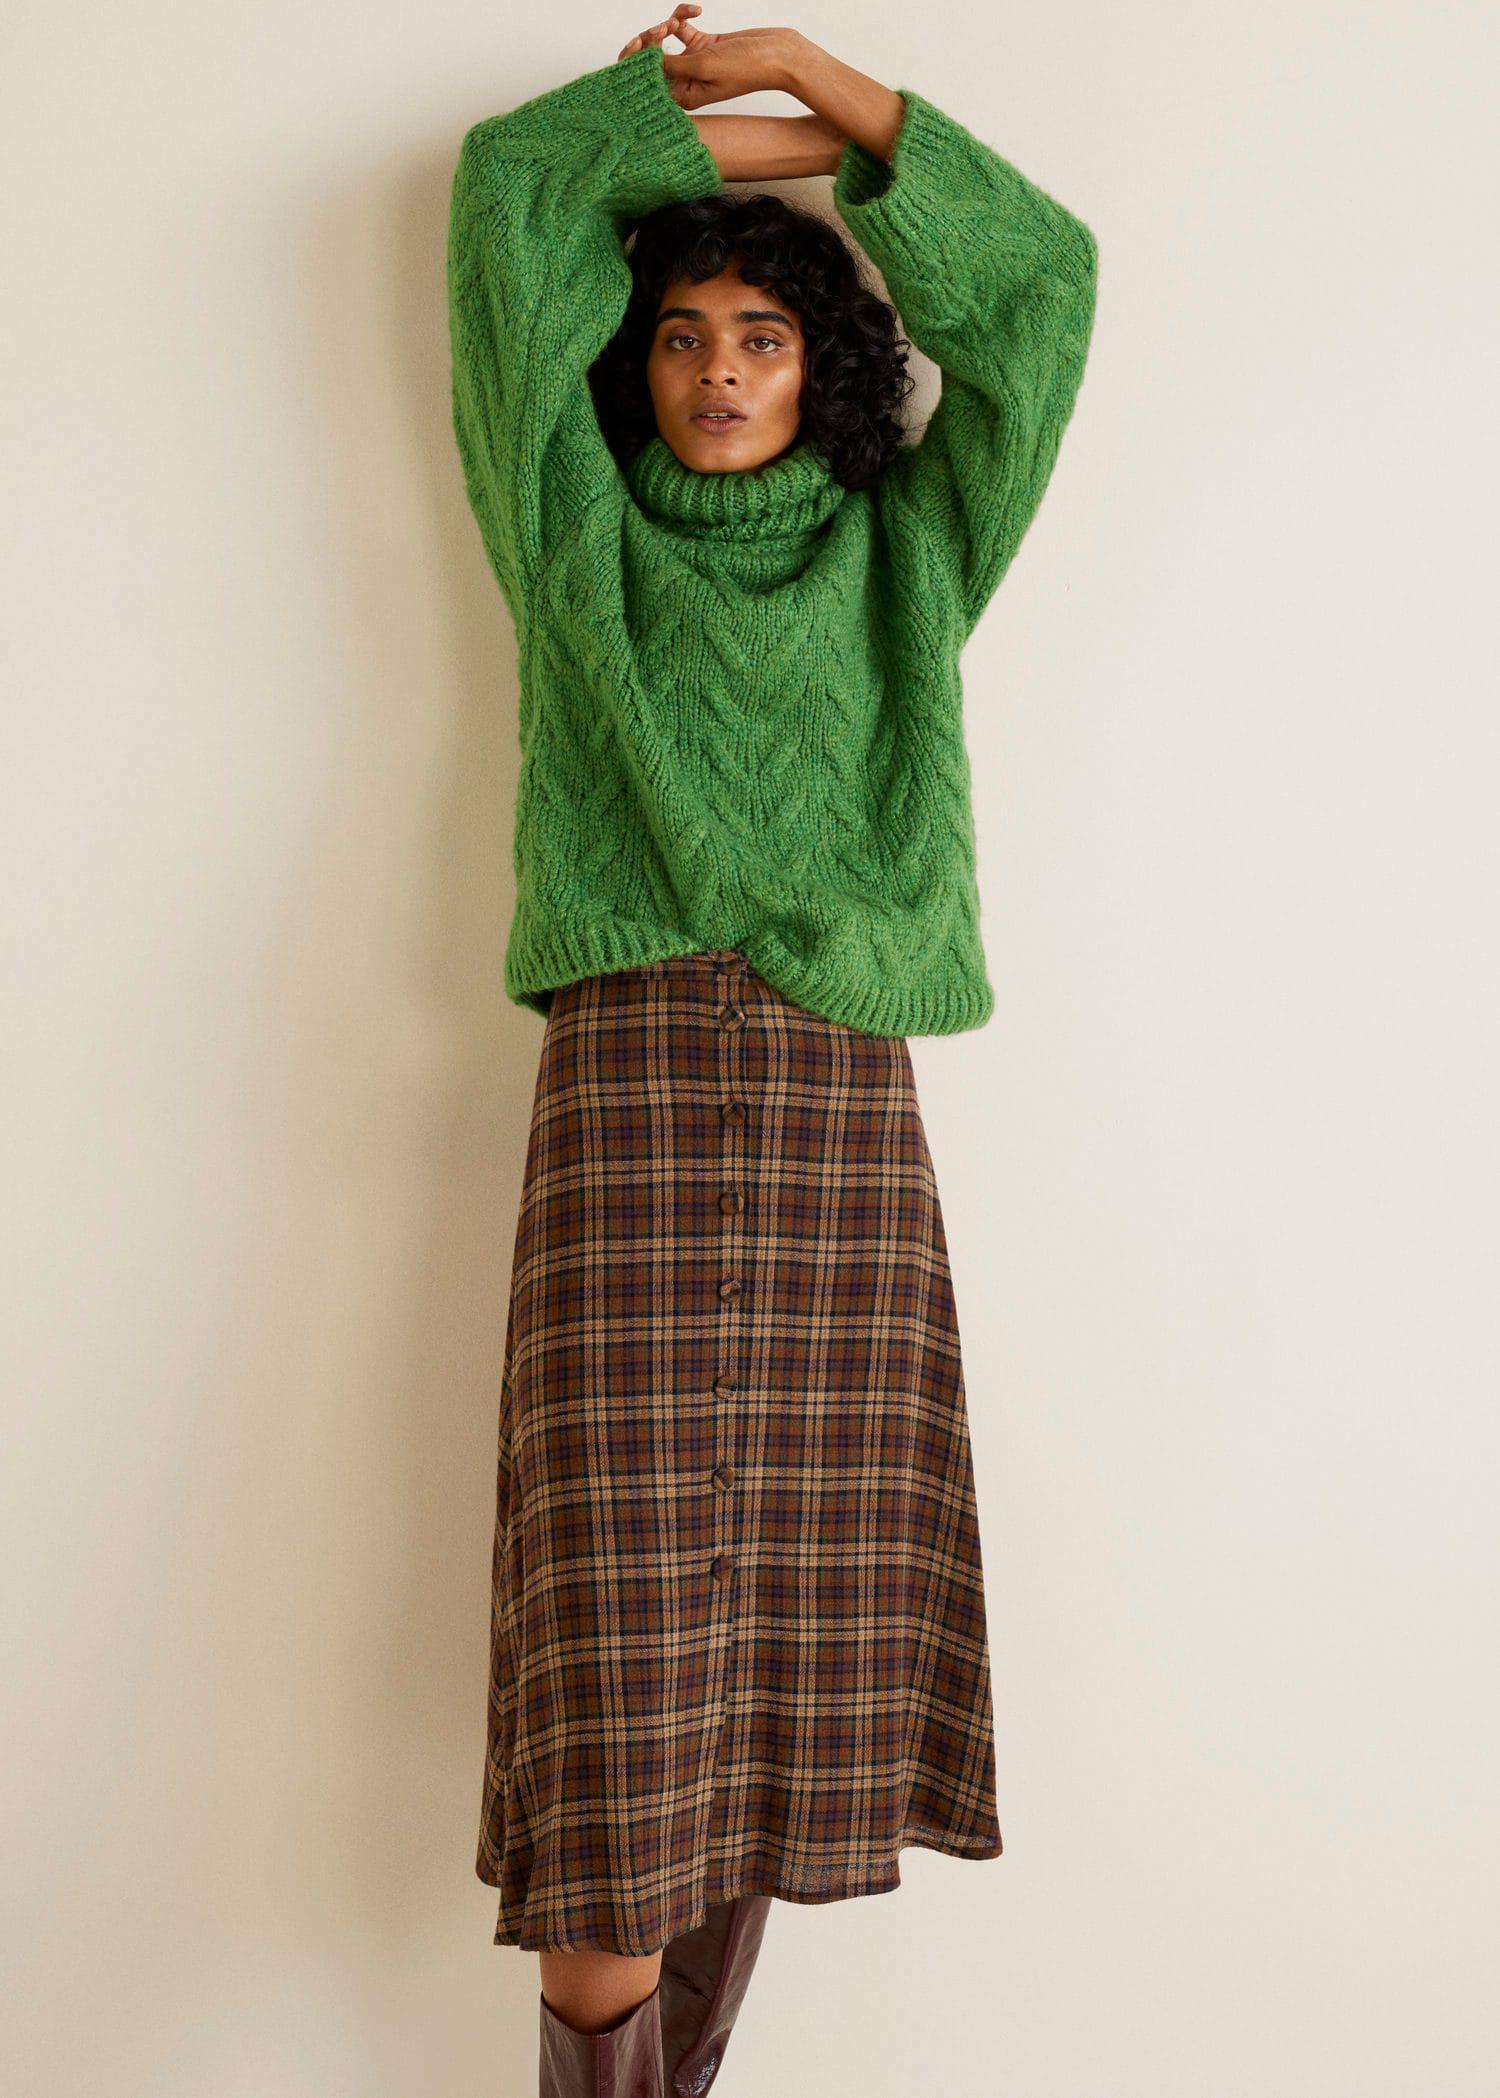 Lyst - Mango Buttoned Midi Skirt in Green 7c1e282f2